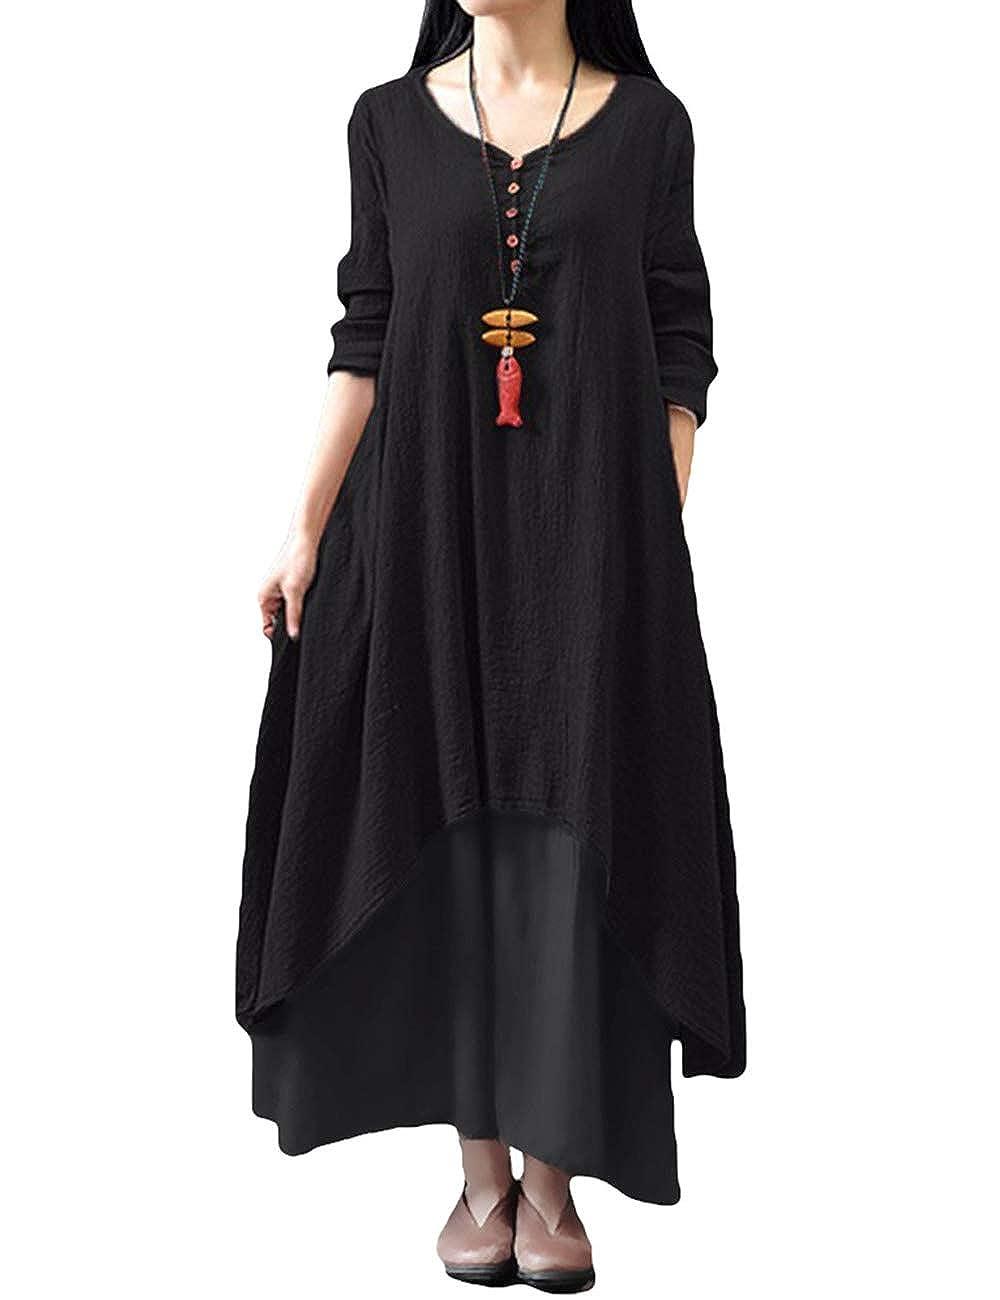 TALLA 5XL. Romacci Vestido Suelto Vestido Ocasional de Las Mujeres Manga Larga Sólida Maxi Vestido Largo de Boho Negro 5XL